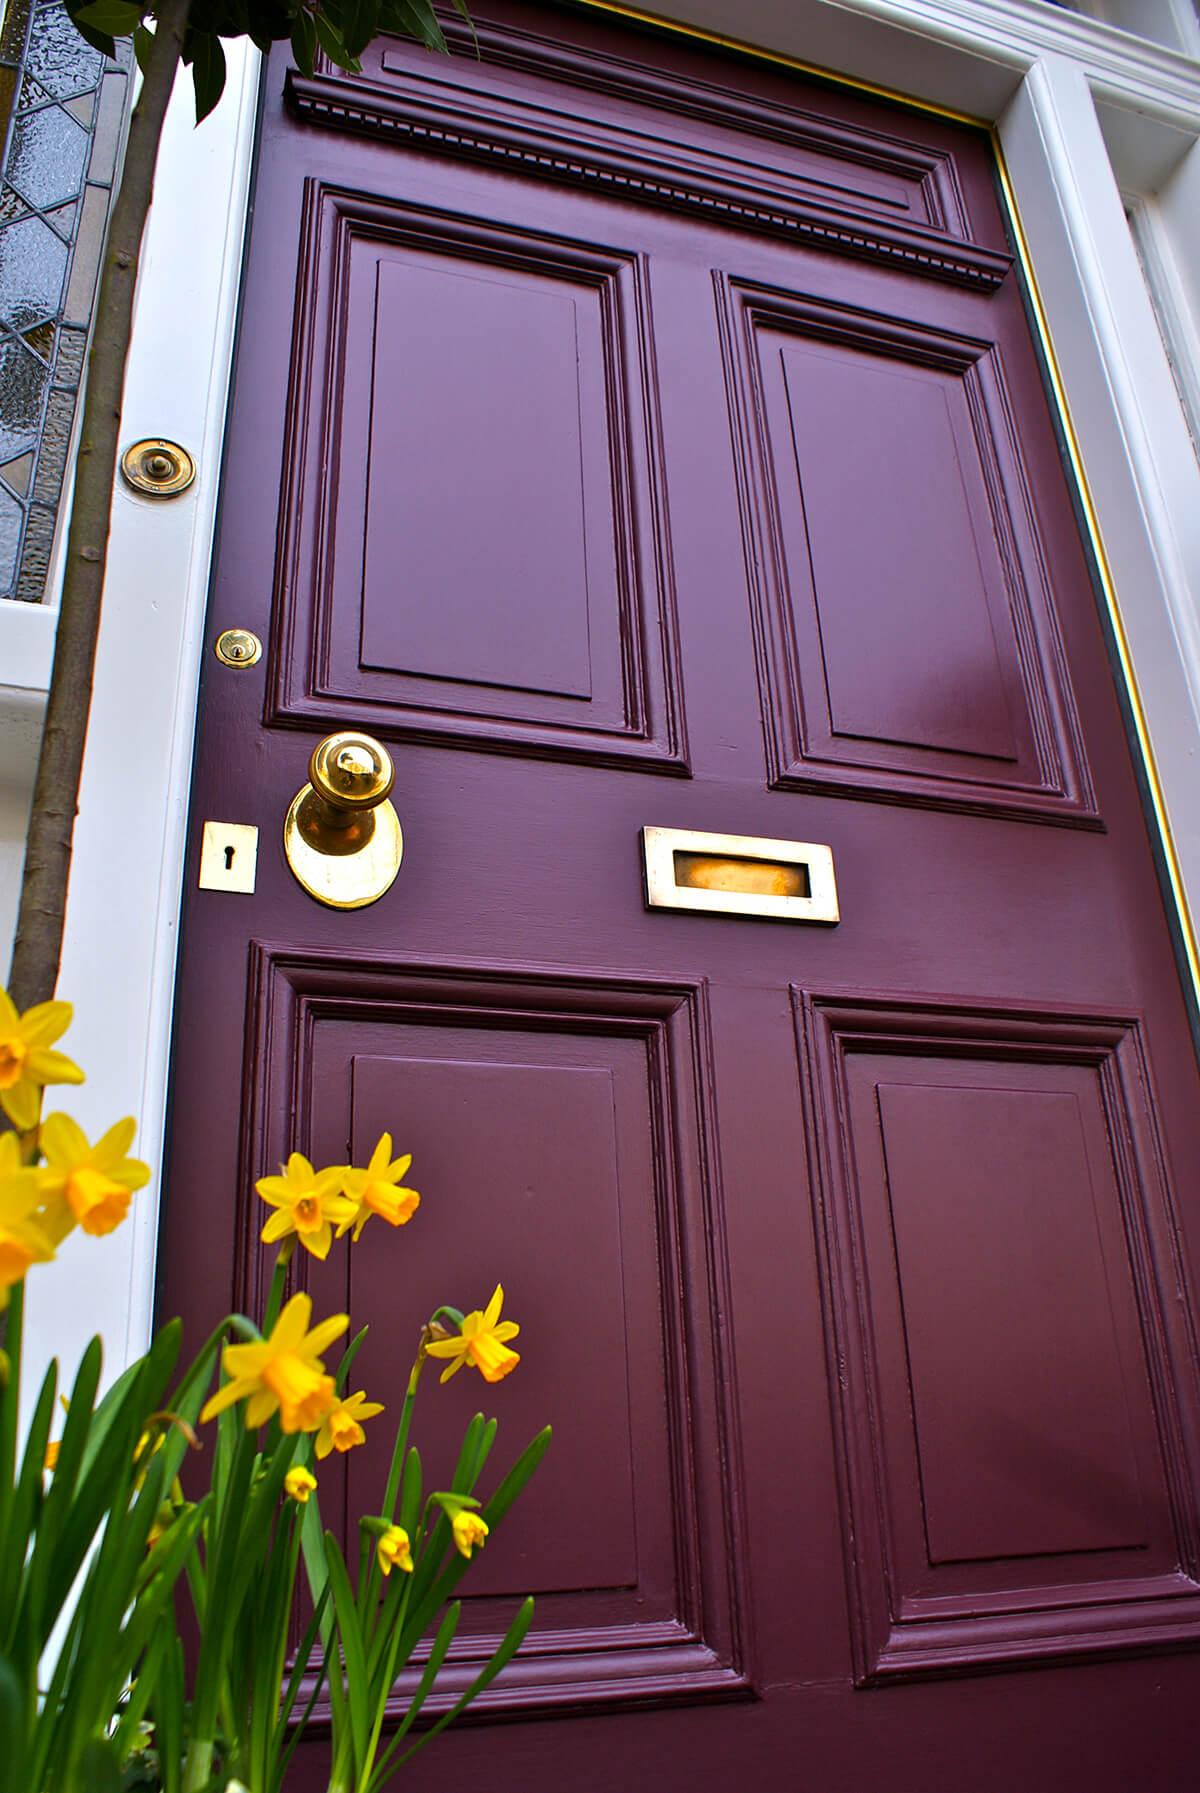 30 Best Front Door Color Ideas and Designs for 2020 on Door Color Ideas  id=69846